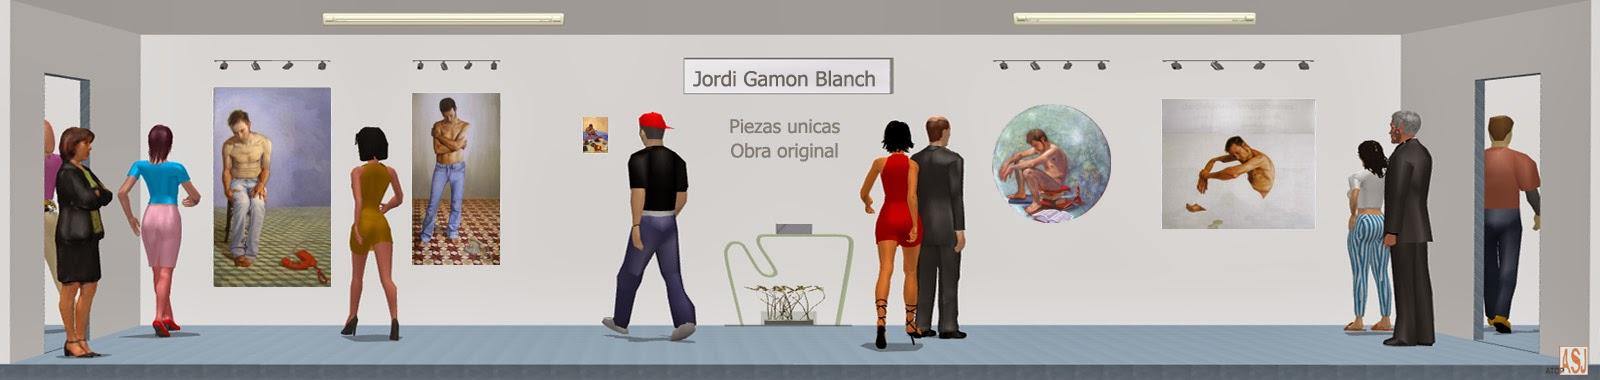 "<img src="" http://2.bp.blogspot.com/-Z1WLO24QcrI/UxZXEW0rIHI/AAAAAAAAVVo/CRRSghOpe9Q/s1600/sala_de_exposicion_de_jordi_gamon_blanch.jpg "" alt="" Sala de exposición virtual de pinturas y retratos de Jordi Gamón Blanch""/>"